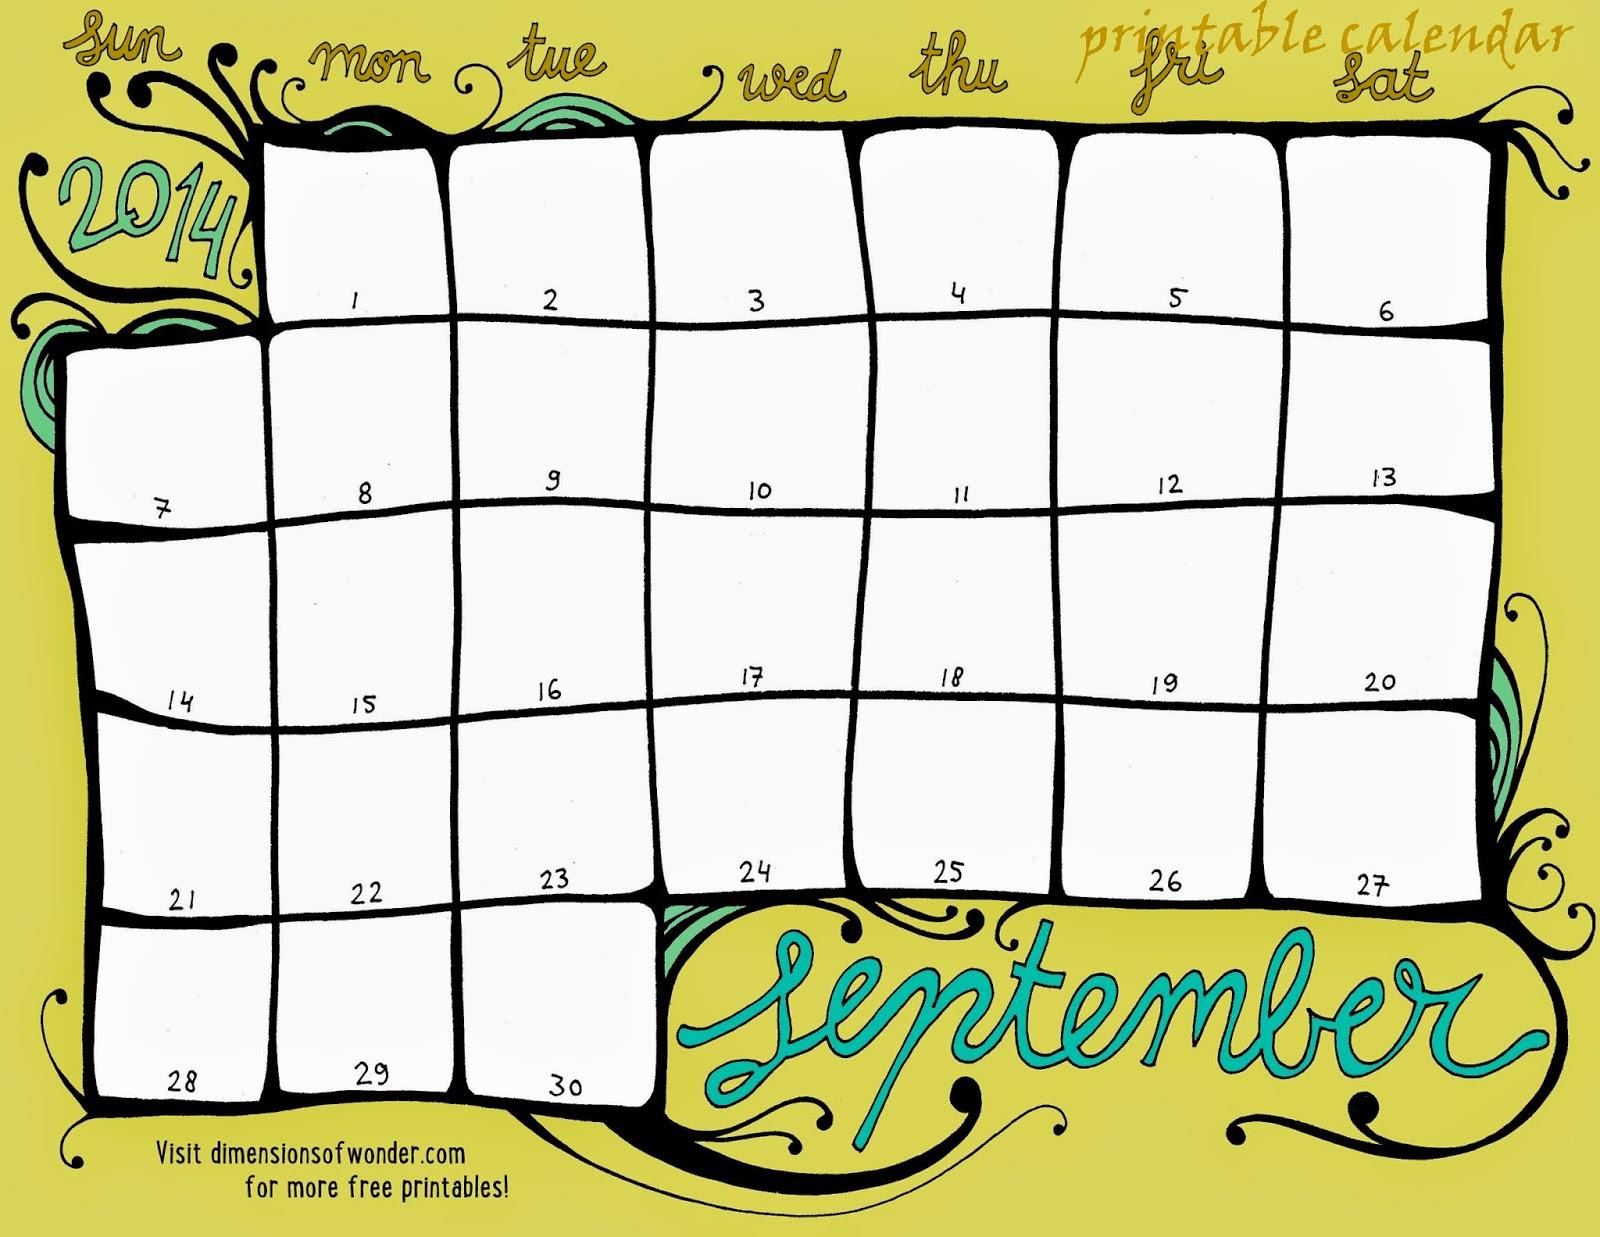 Printables Calendar September : Free printable calendar september